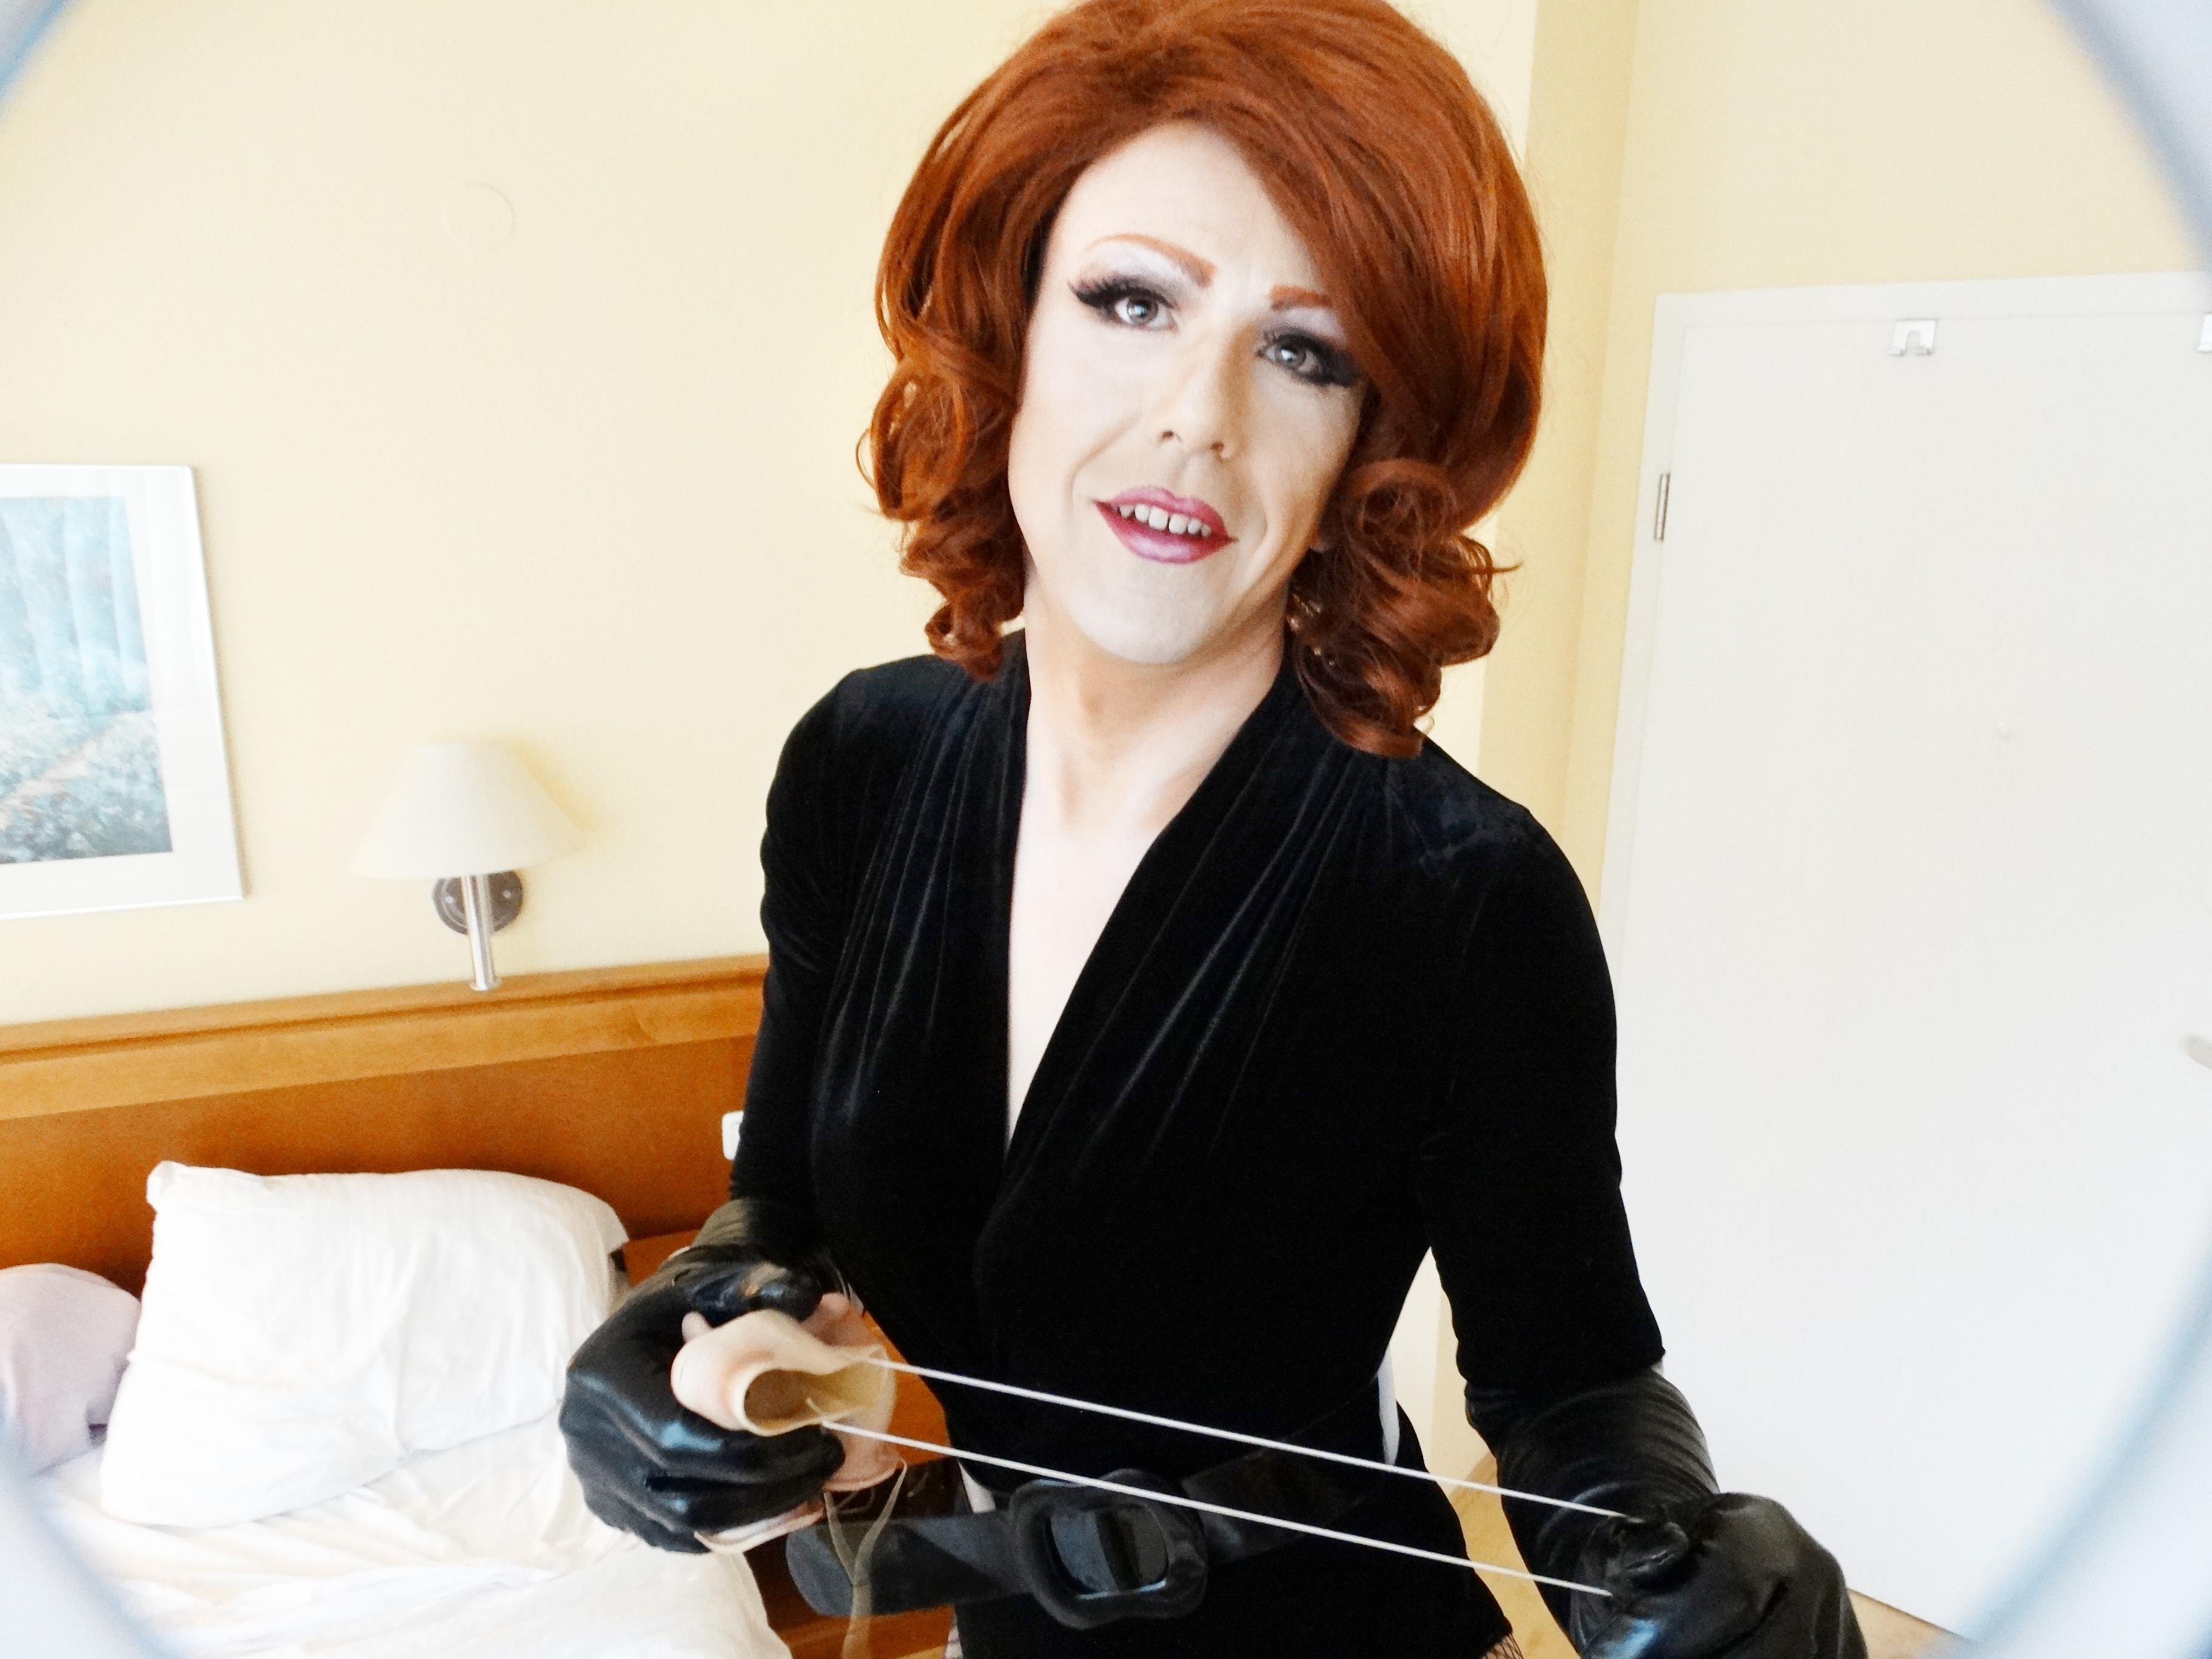 Sexiest Transvestite